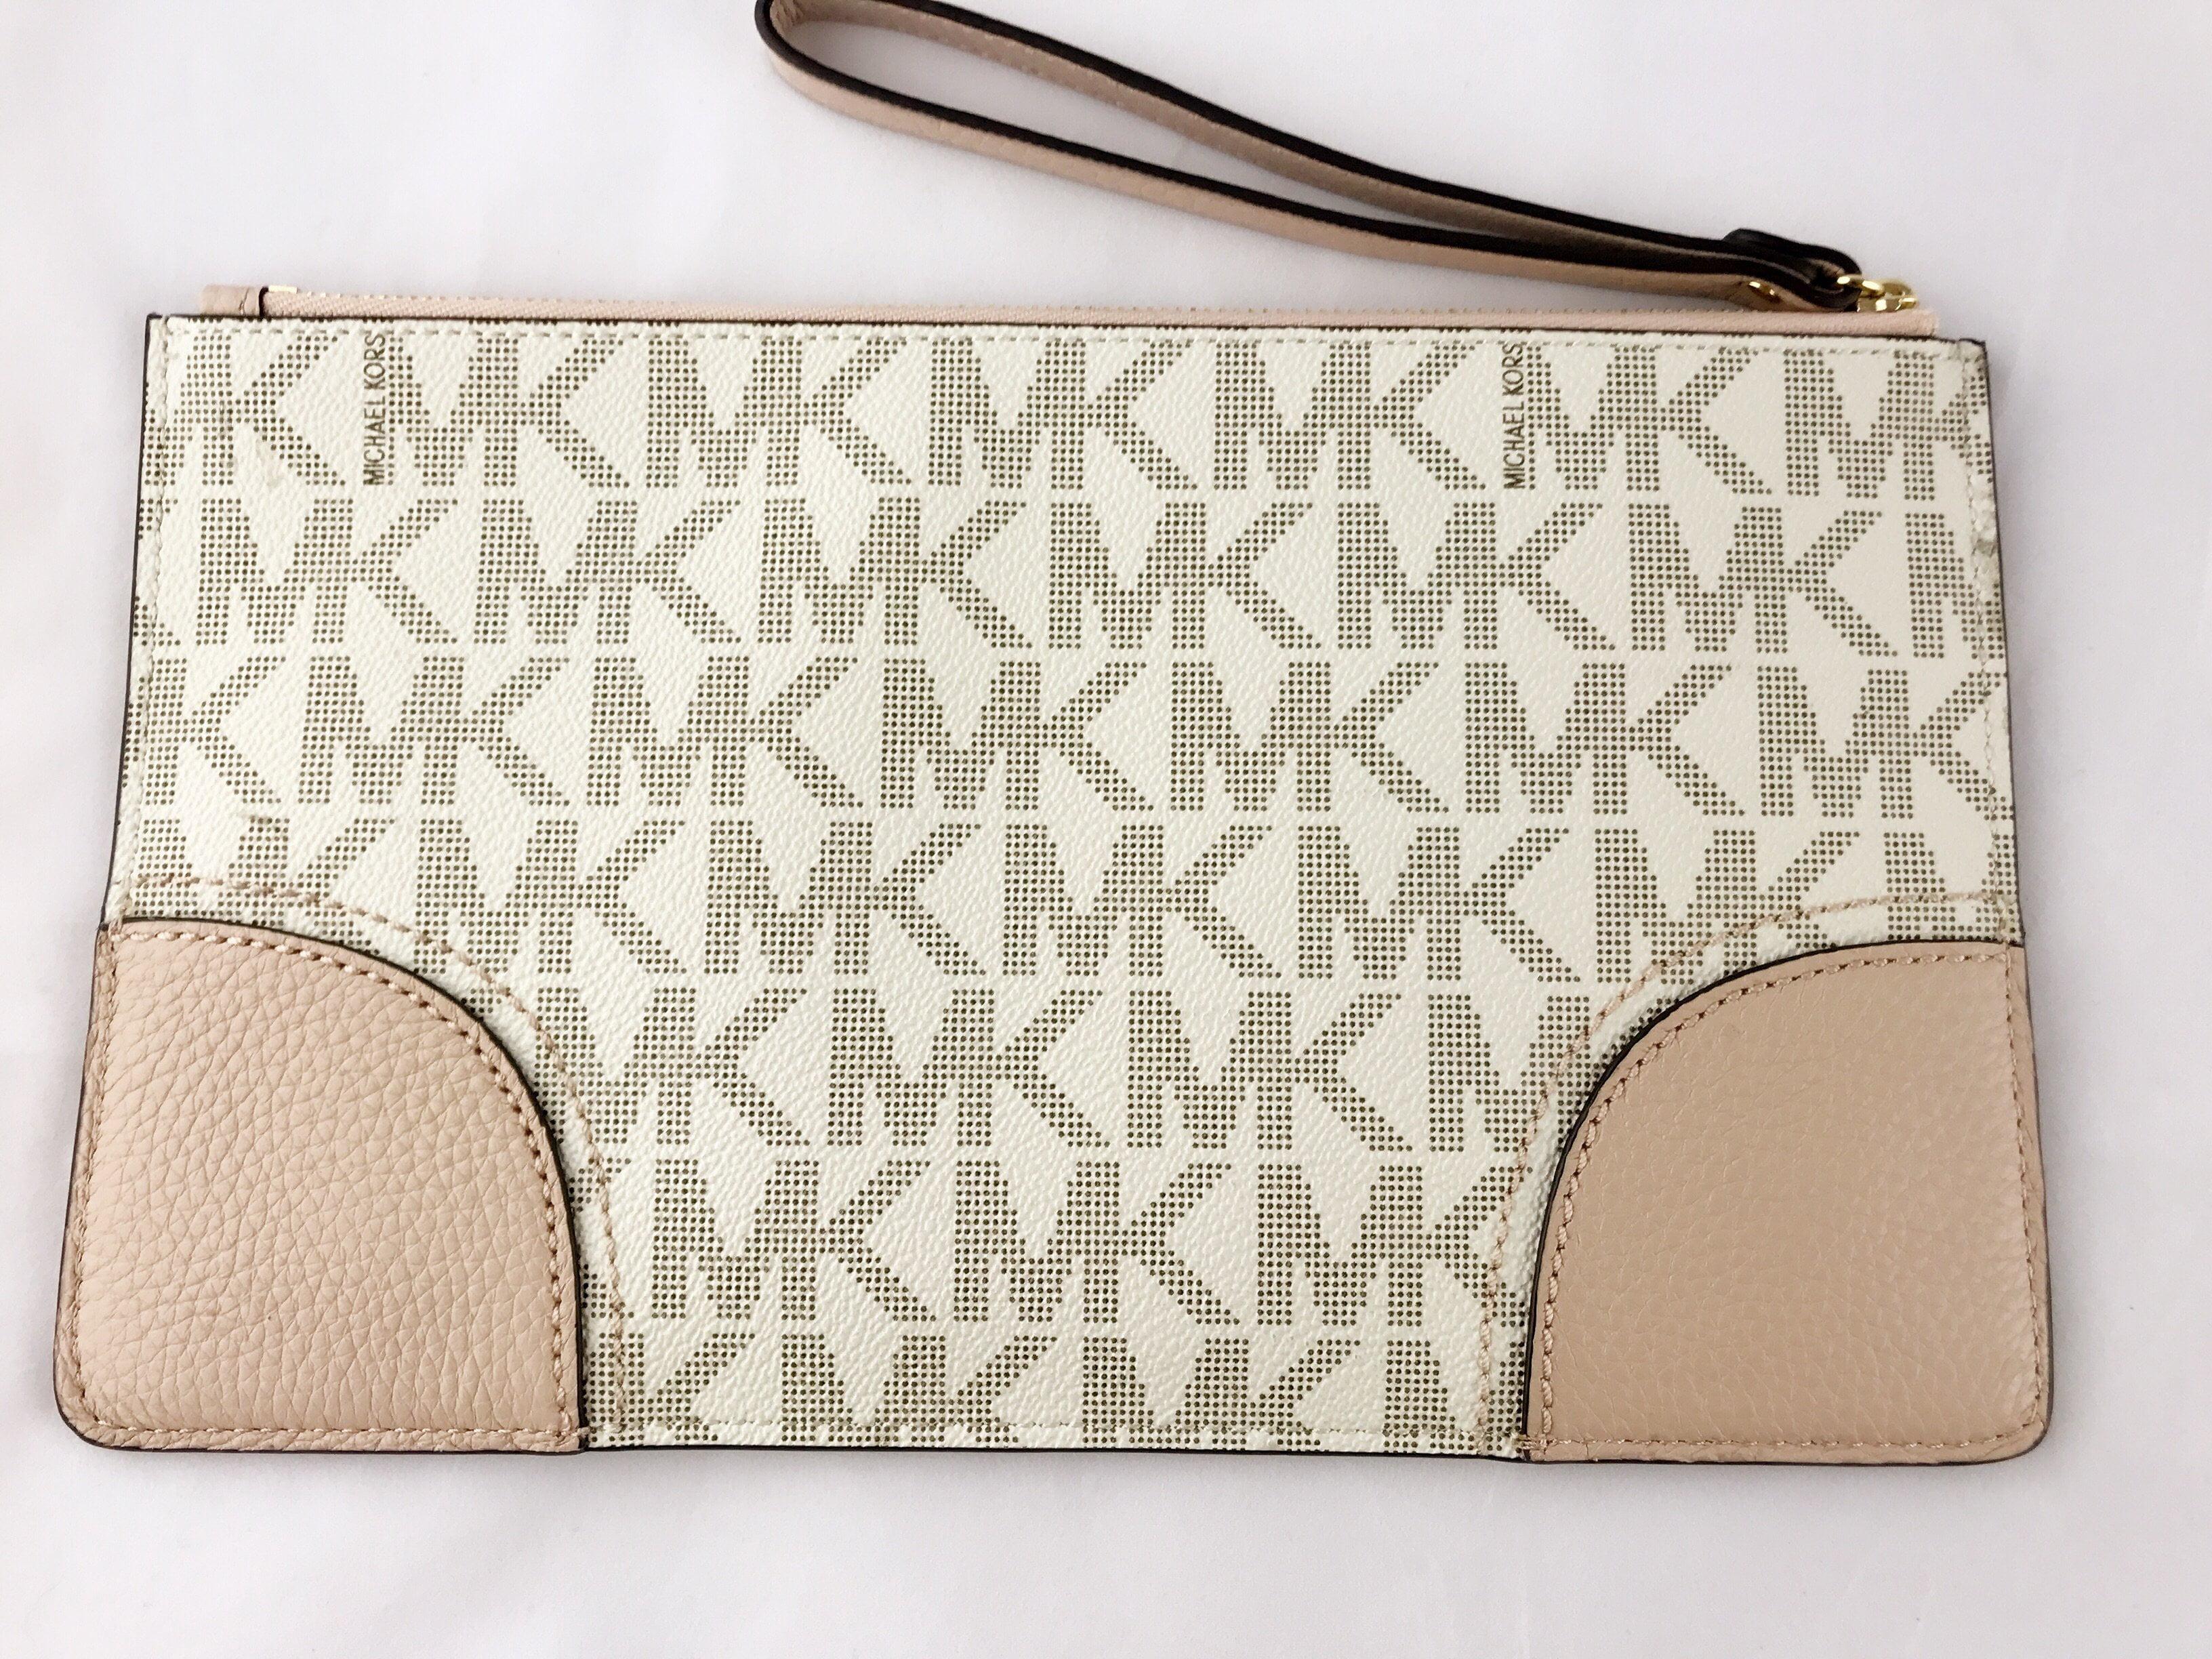 988be3d7688e Michael Kors - Michael Kors Hattie Vanilla Ballet Pink PVC Signature Zip  Clutch Wristlet Wallet - Walmart.com